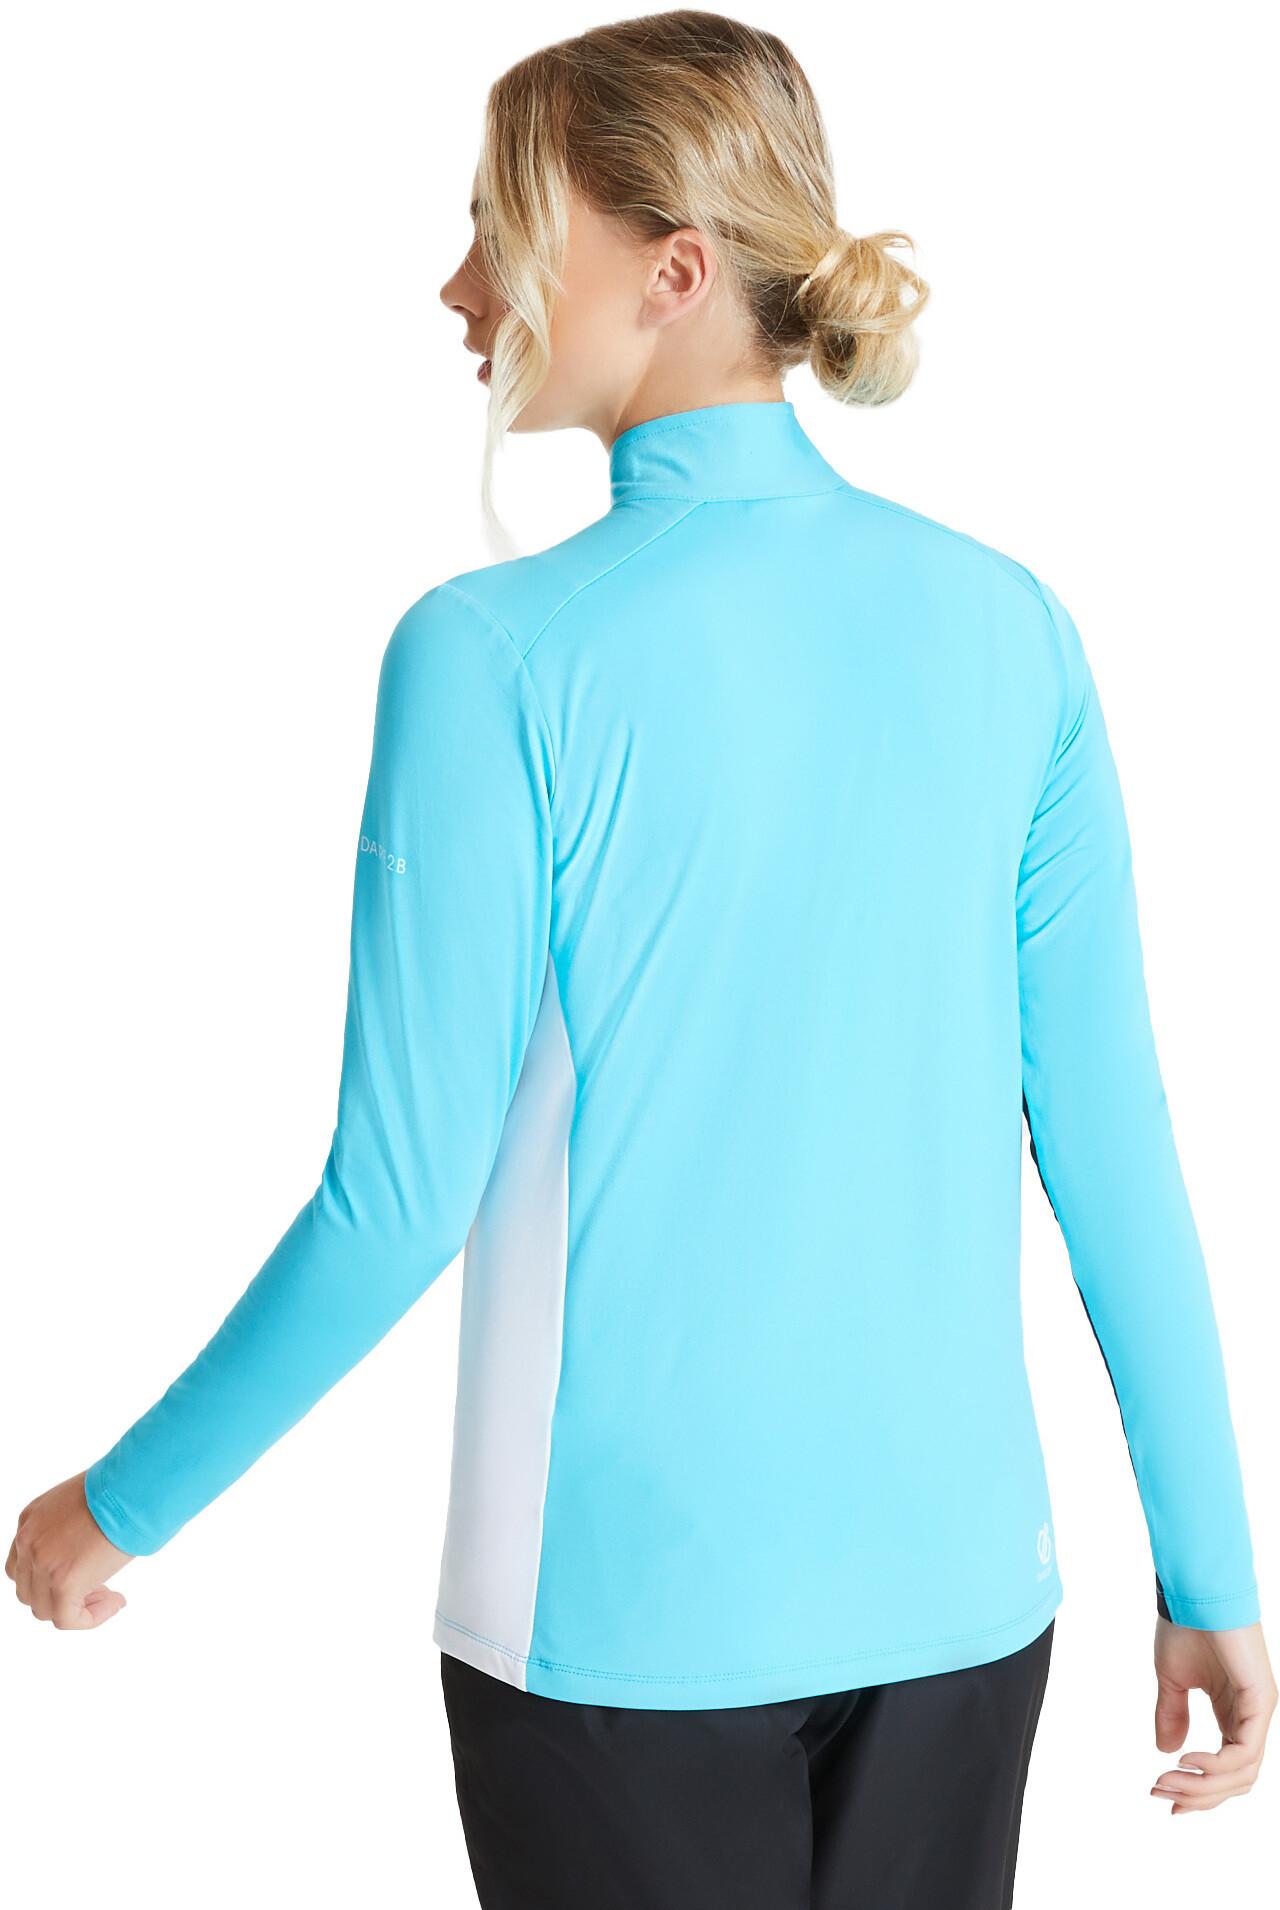 Dare 2b Default Core Stretch Bluza Kobiety, azure blue/black/white (2020)